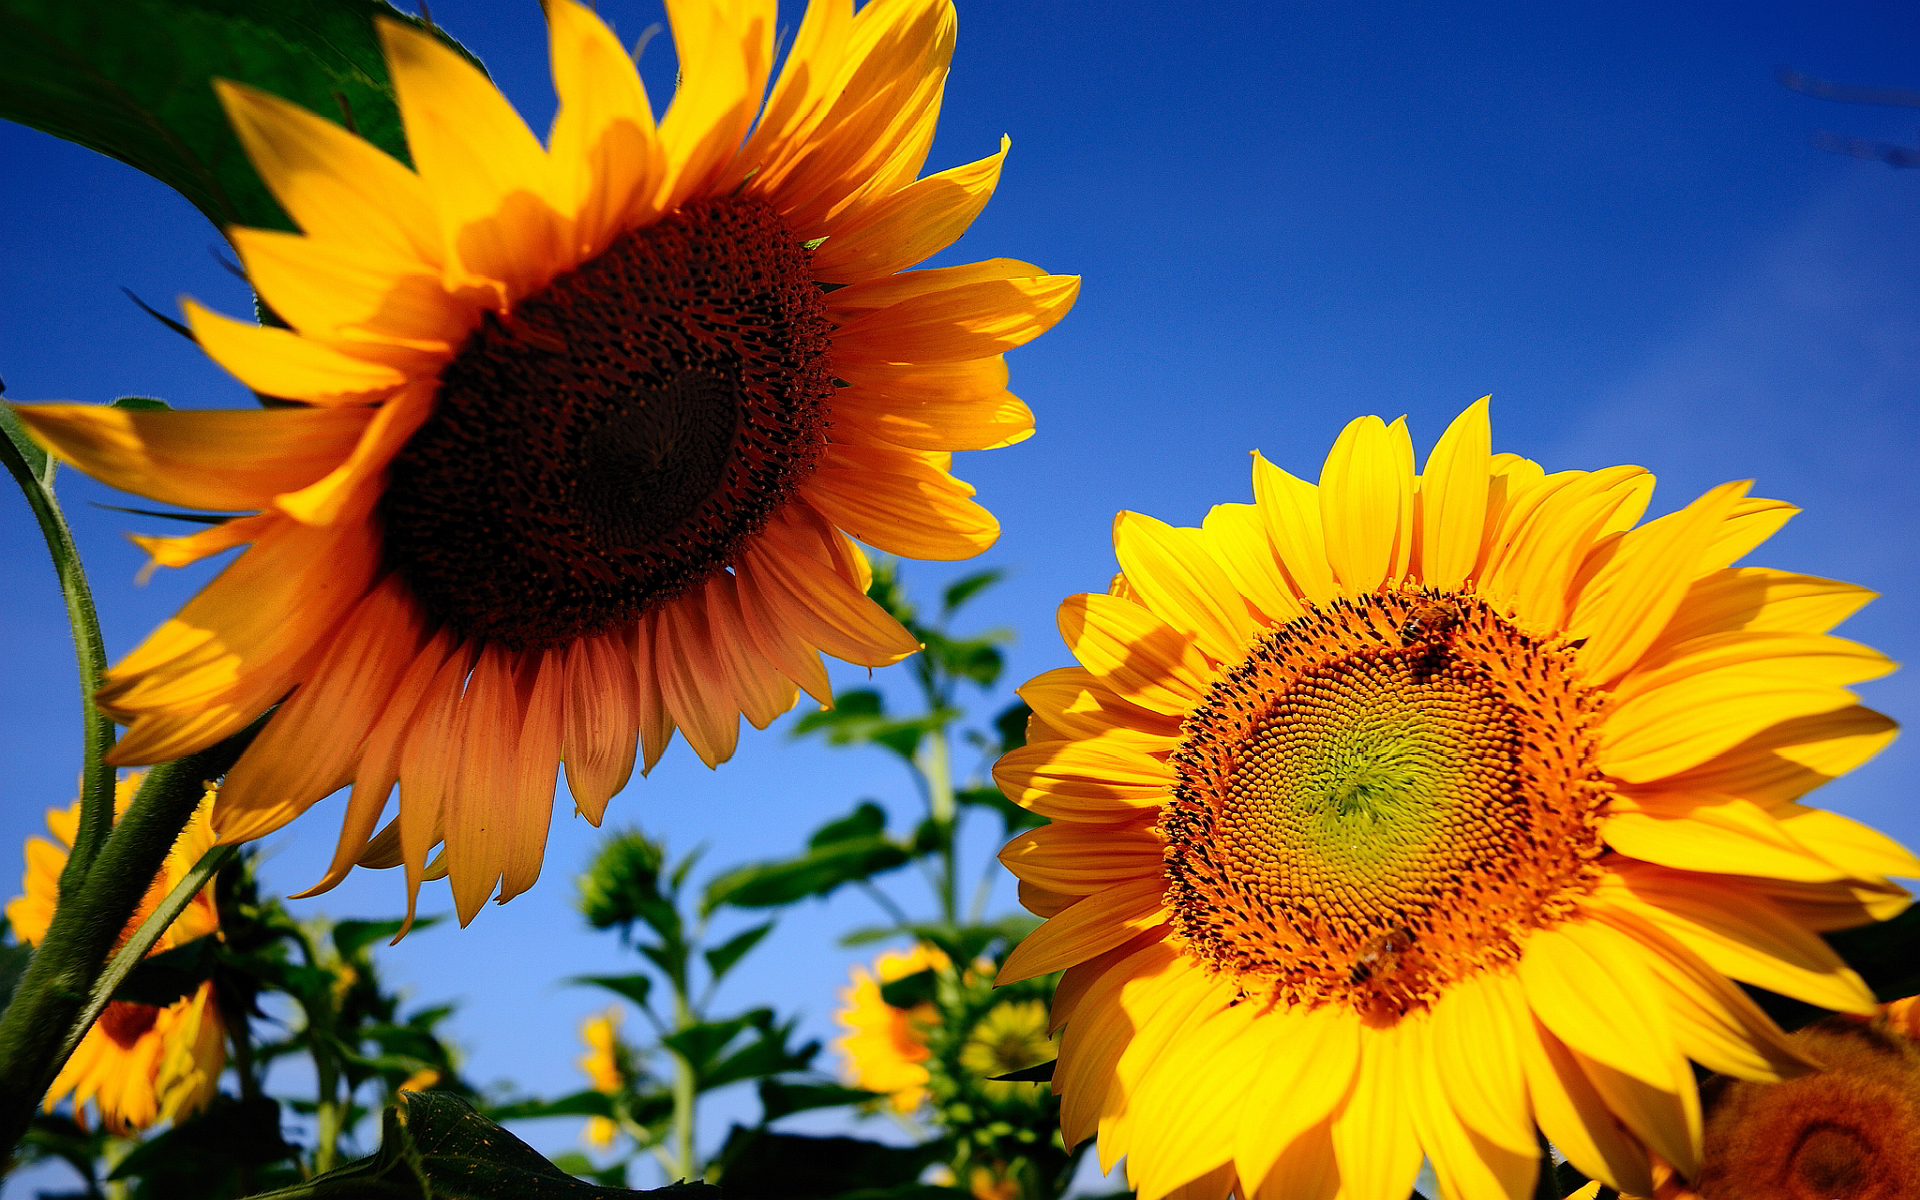 sunflowers background hd